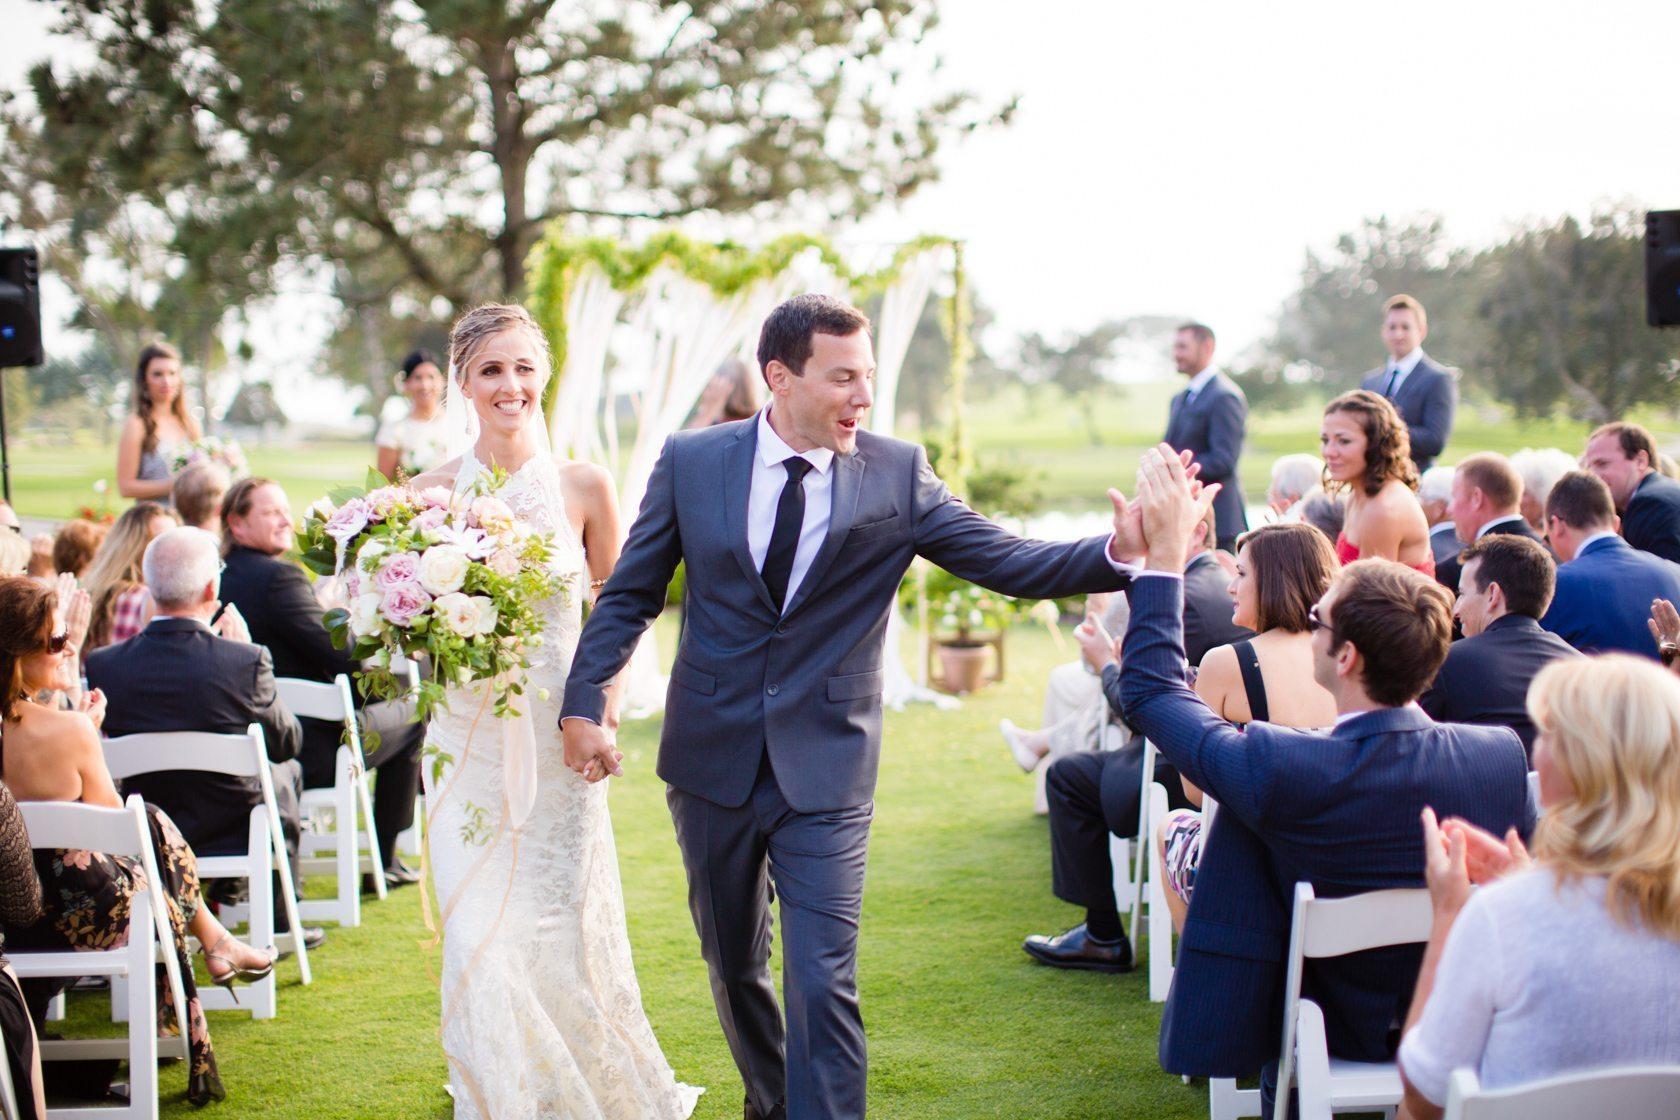 The_Lodge_at_Torrey_Pines_Wedding_066.jpg